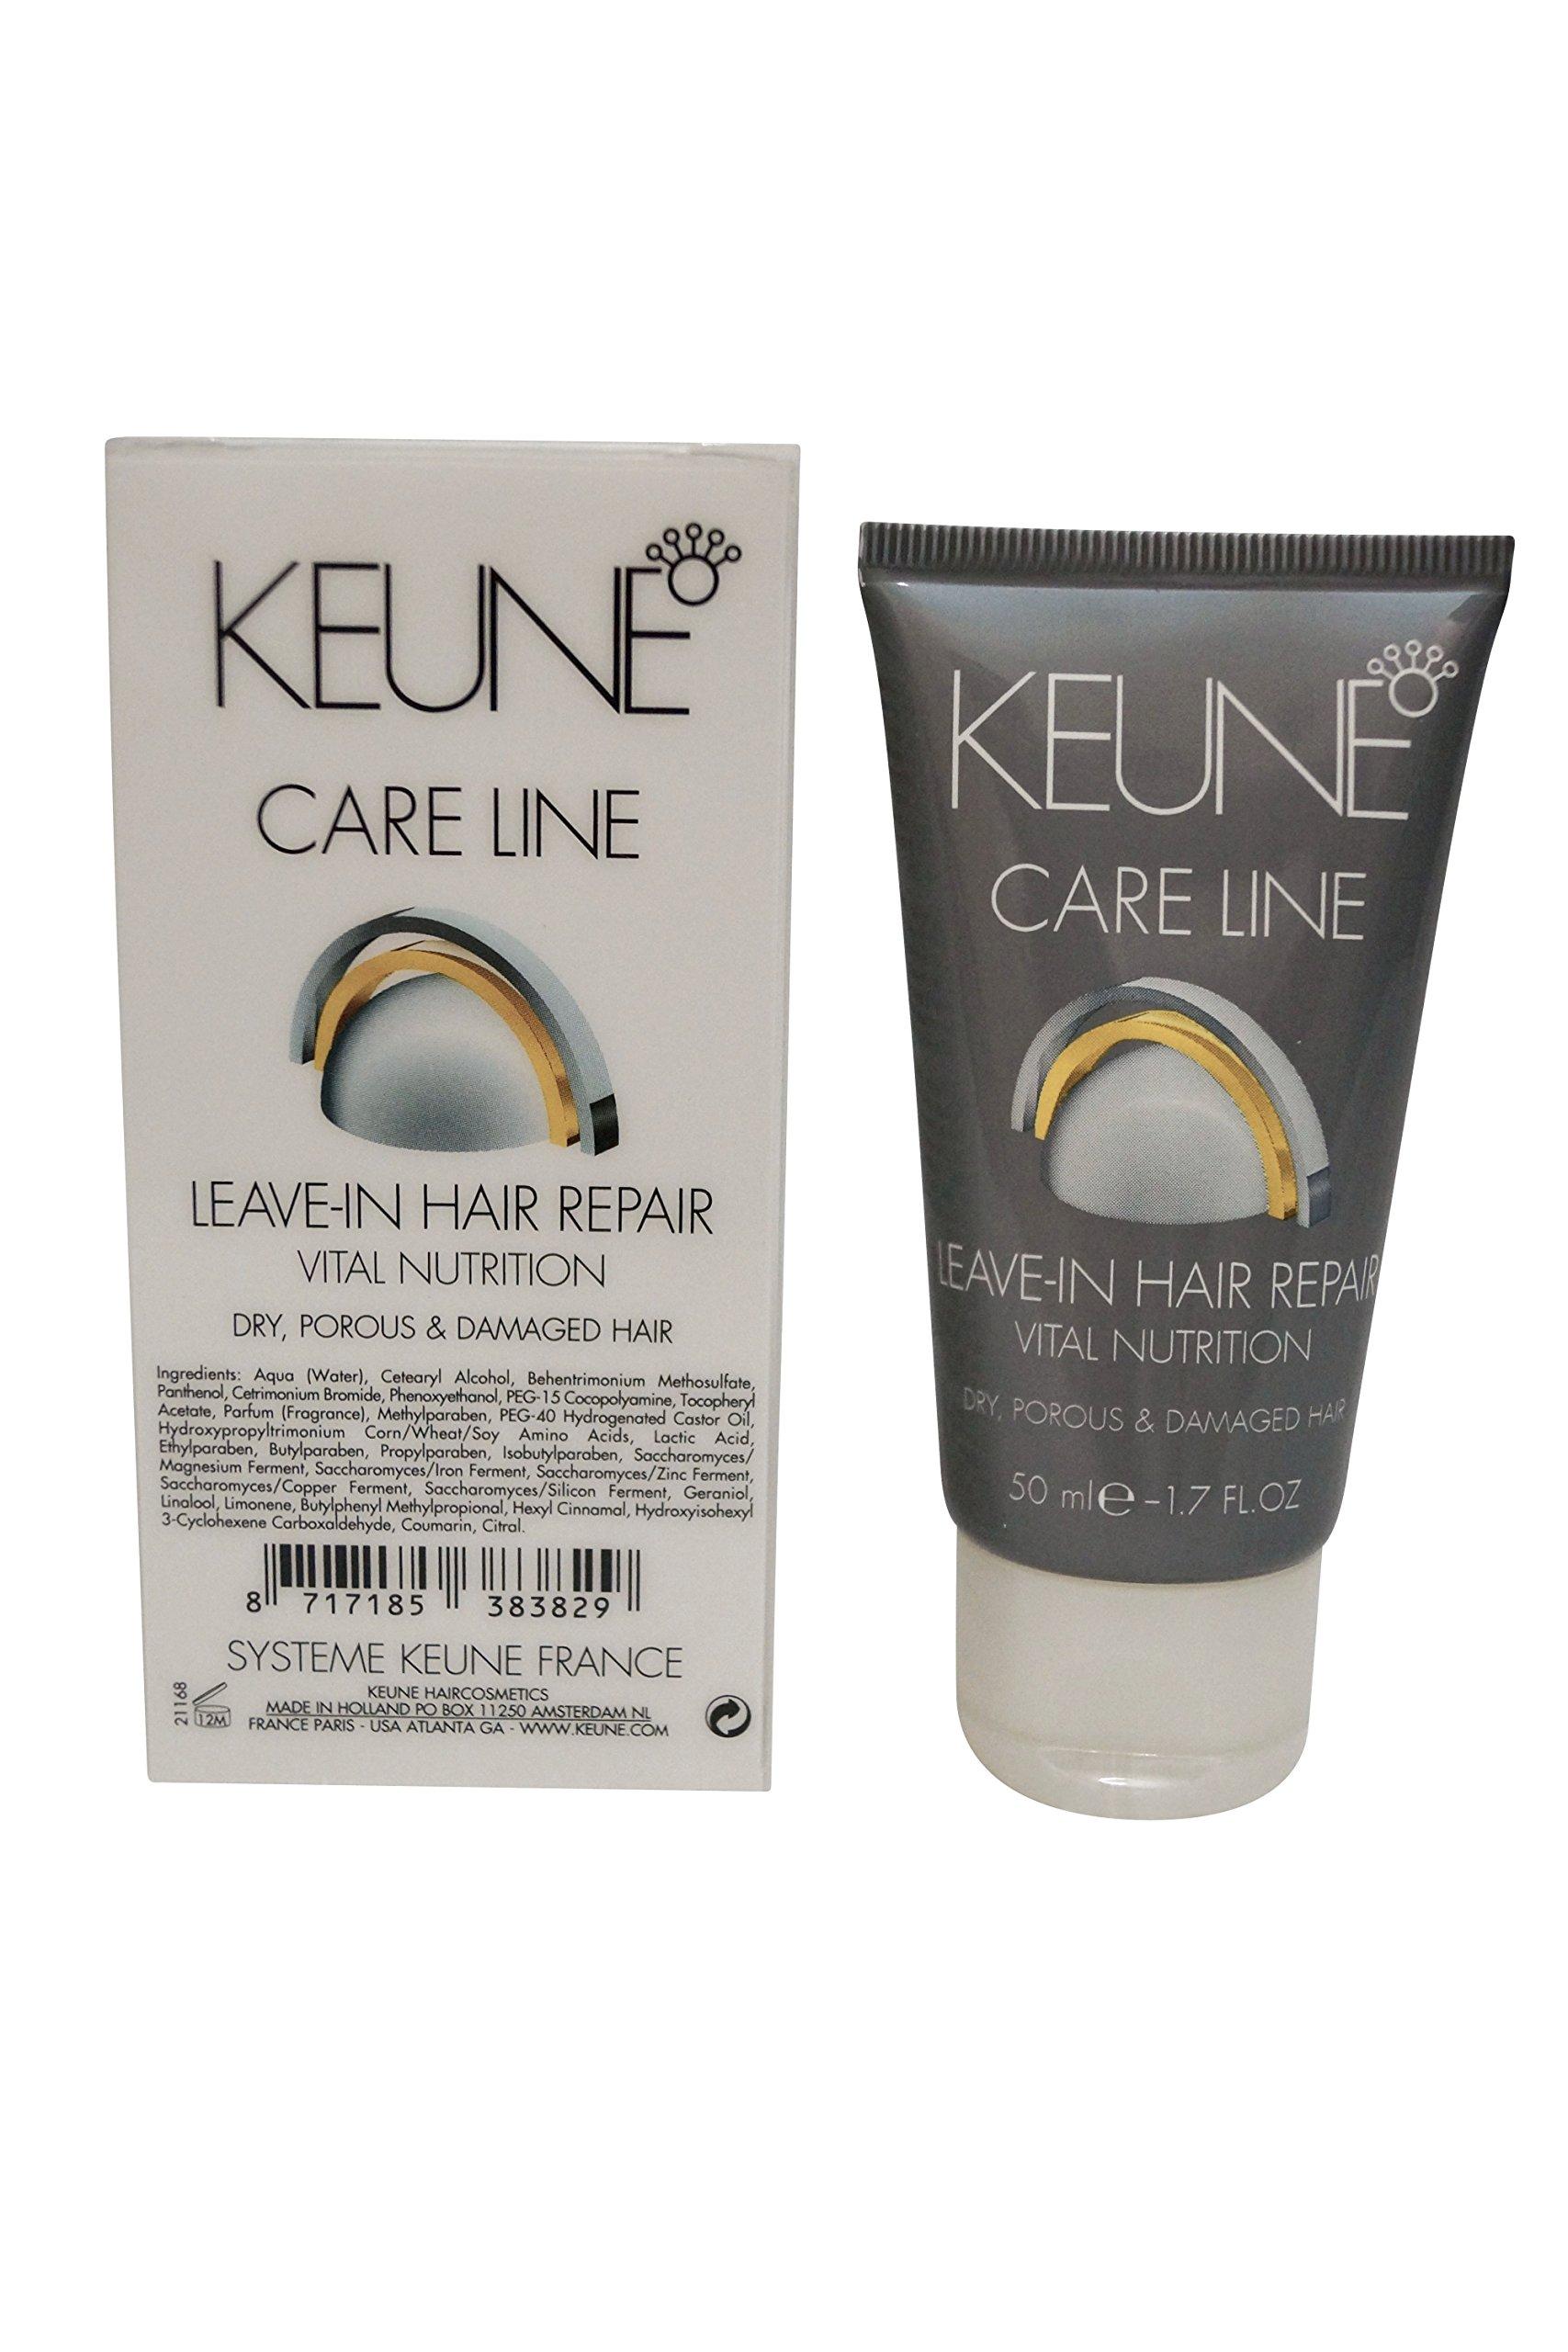 Keune Care Line Vital Nutrition Leave-in Hair Repair, 1.7 oz